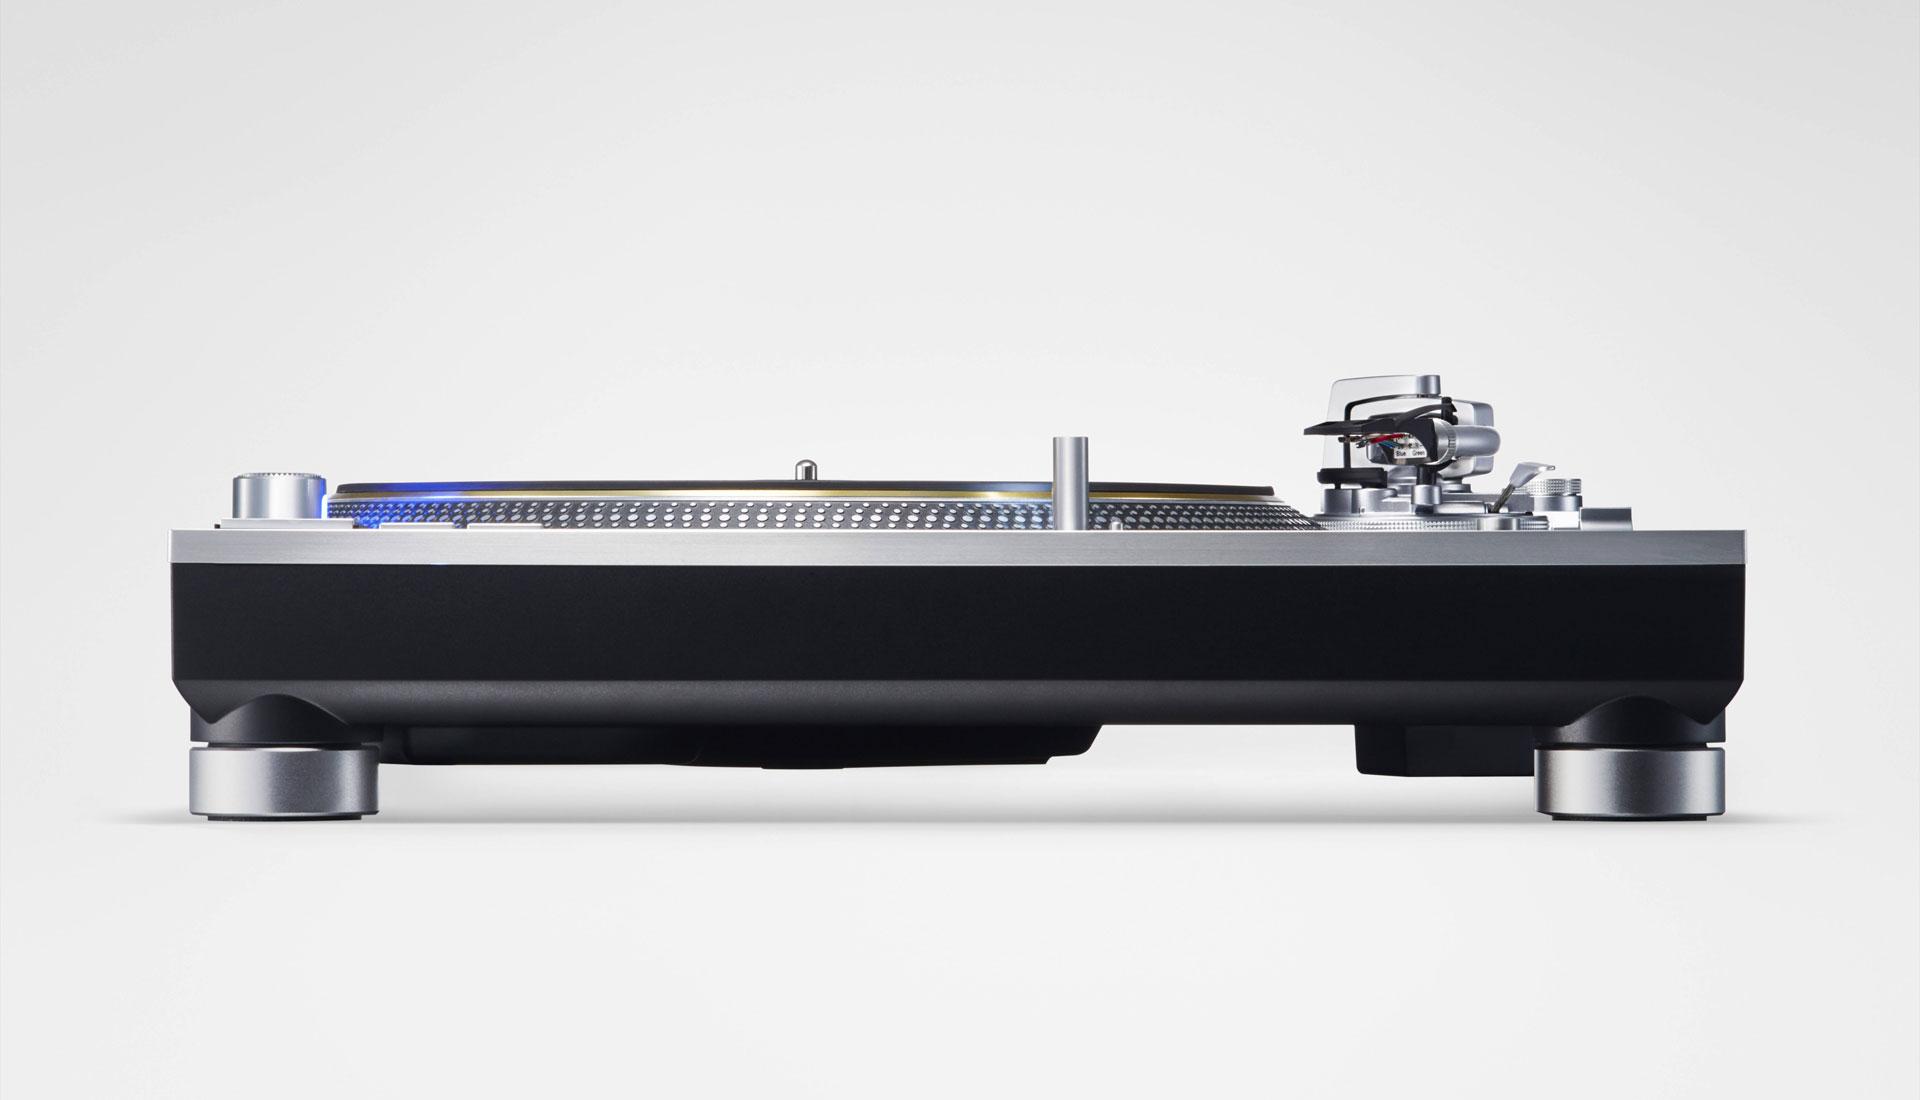 Technics limited edition Grand Class SL-1200GAE